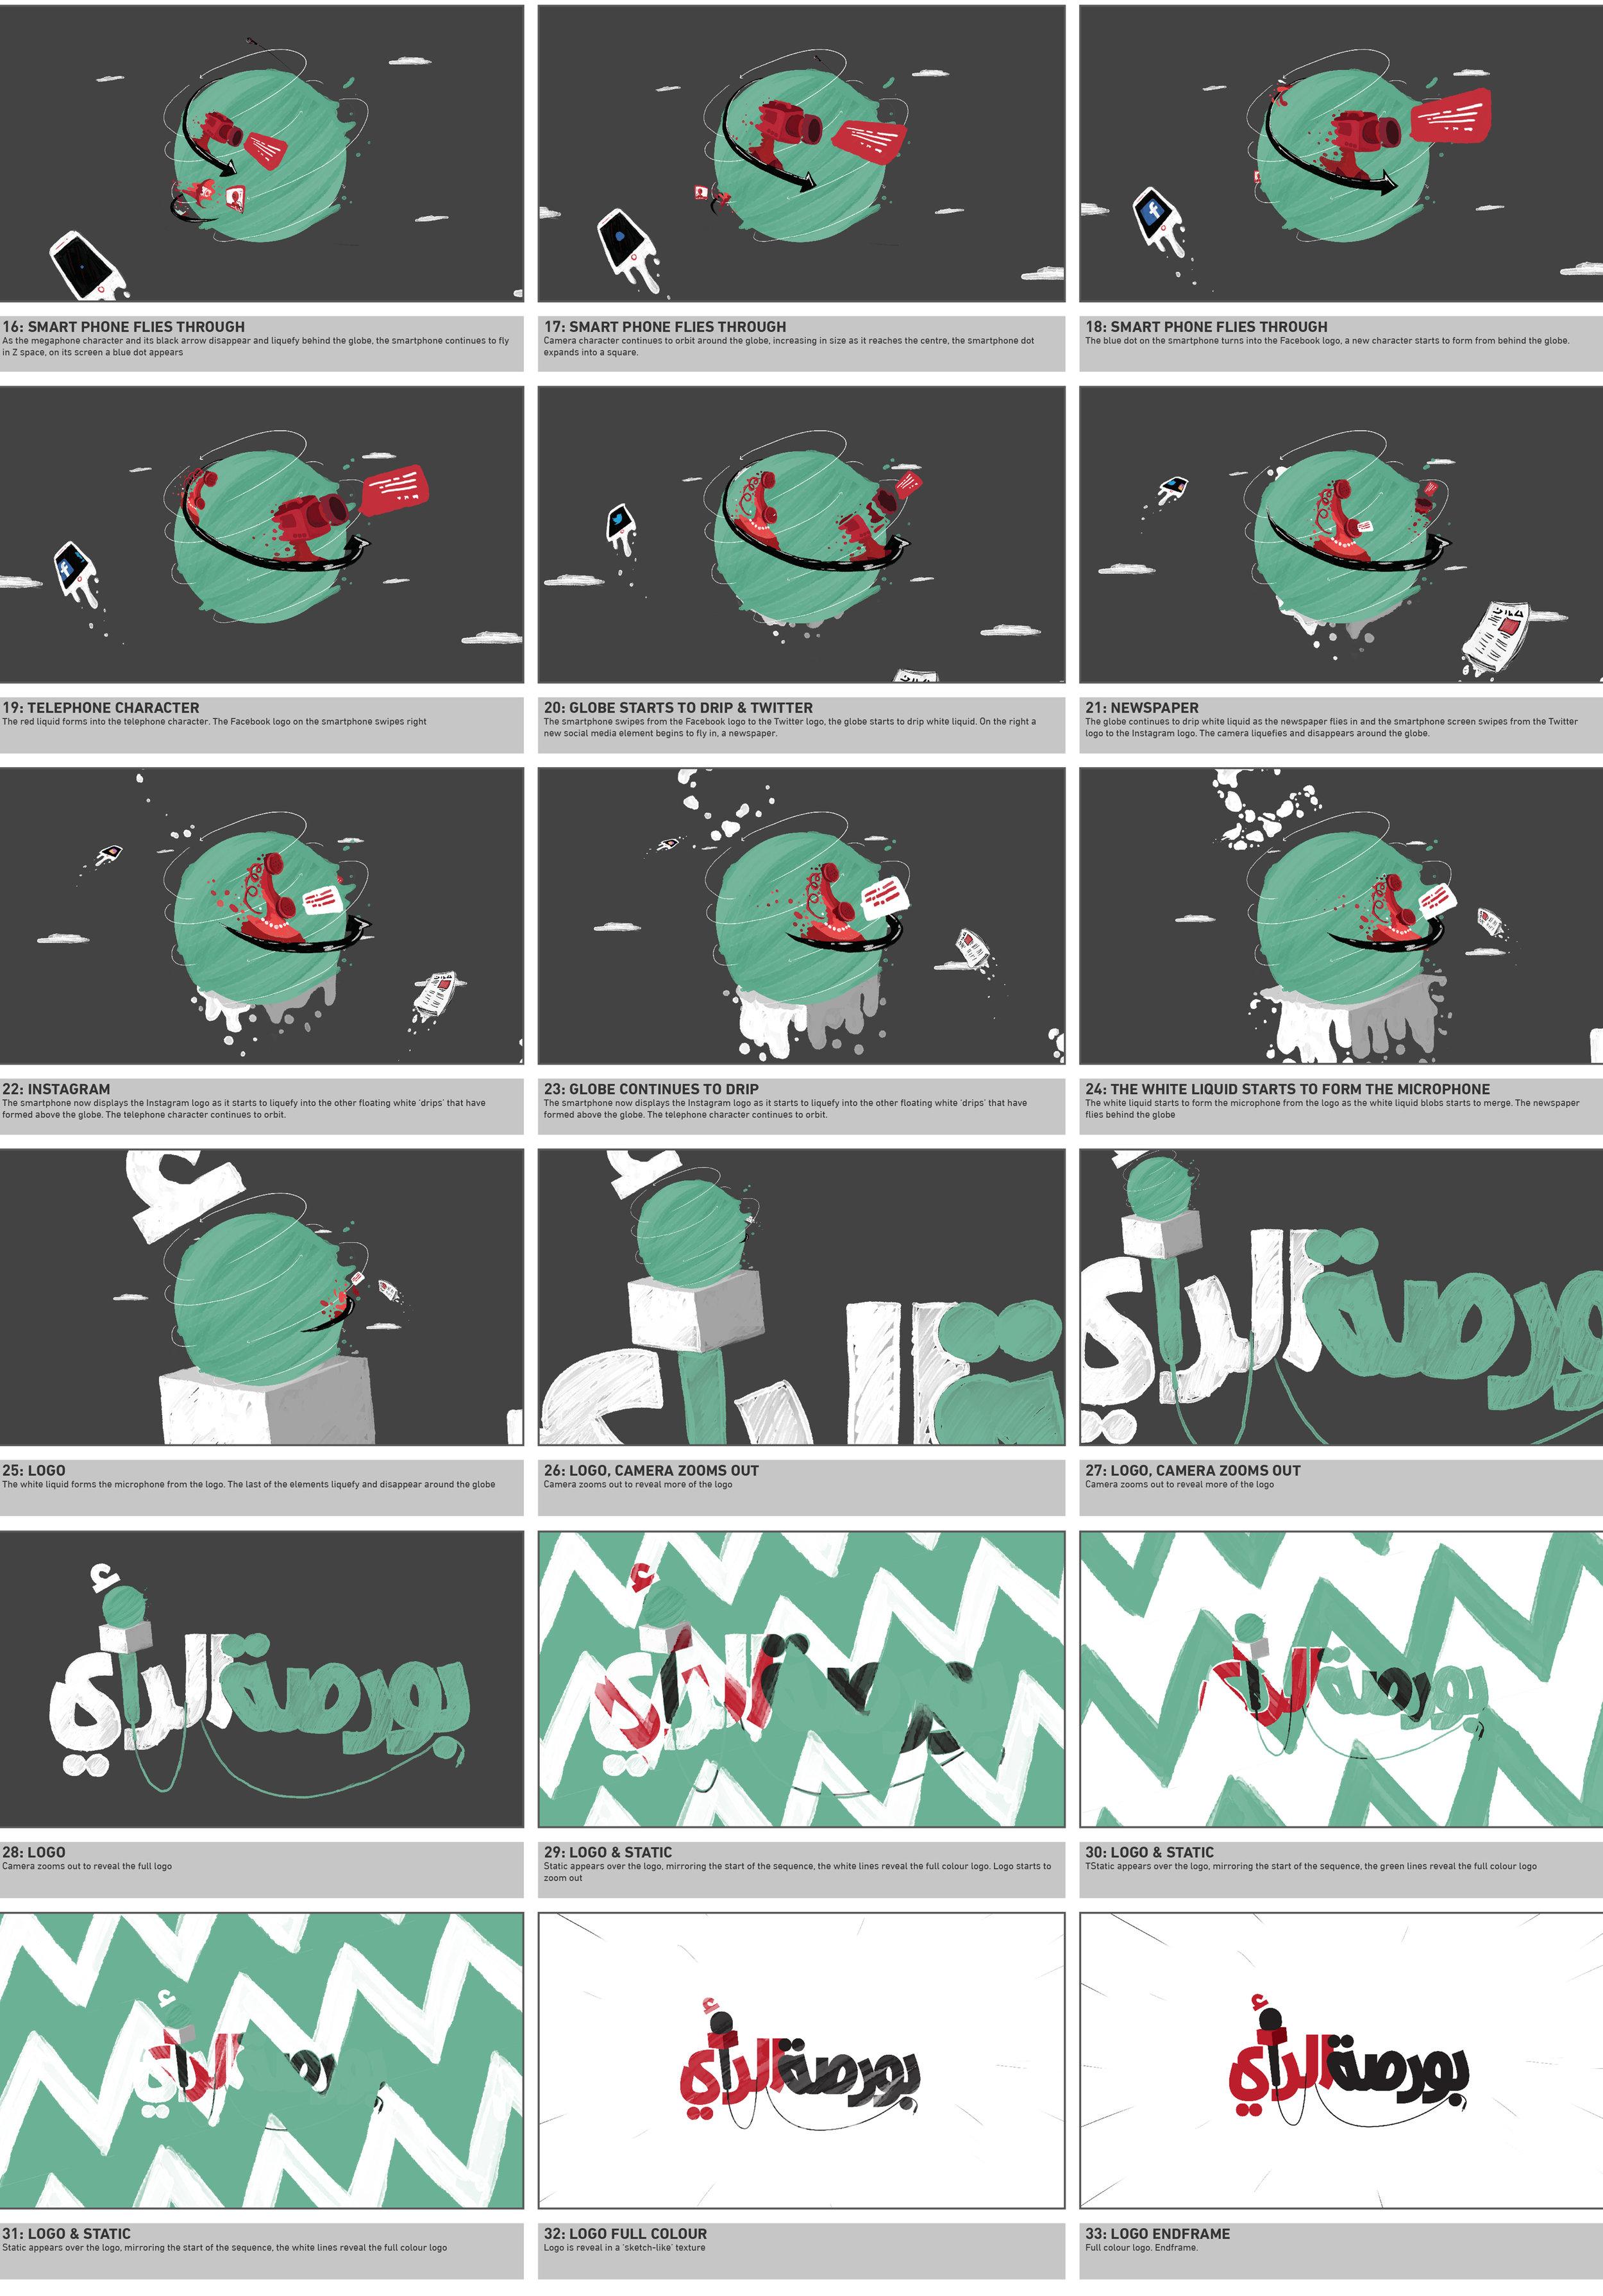 Storyboard_Bursa_02.jpg